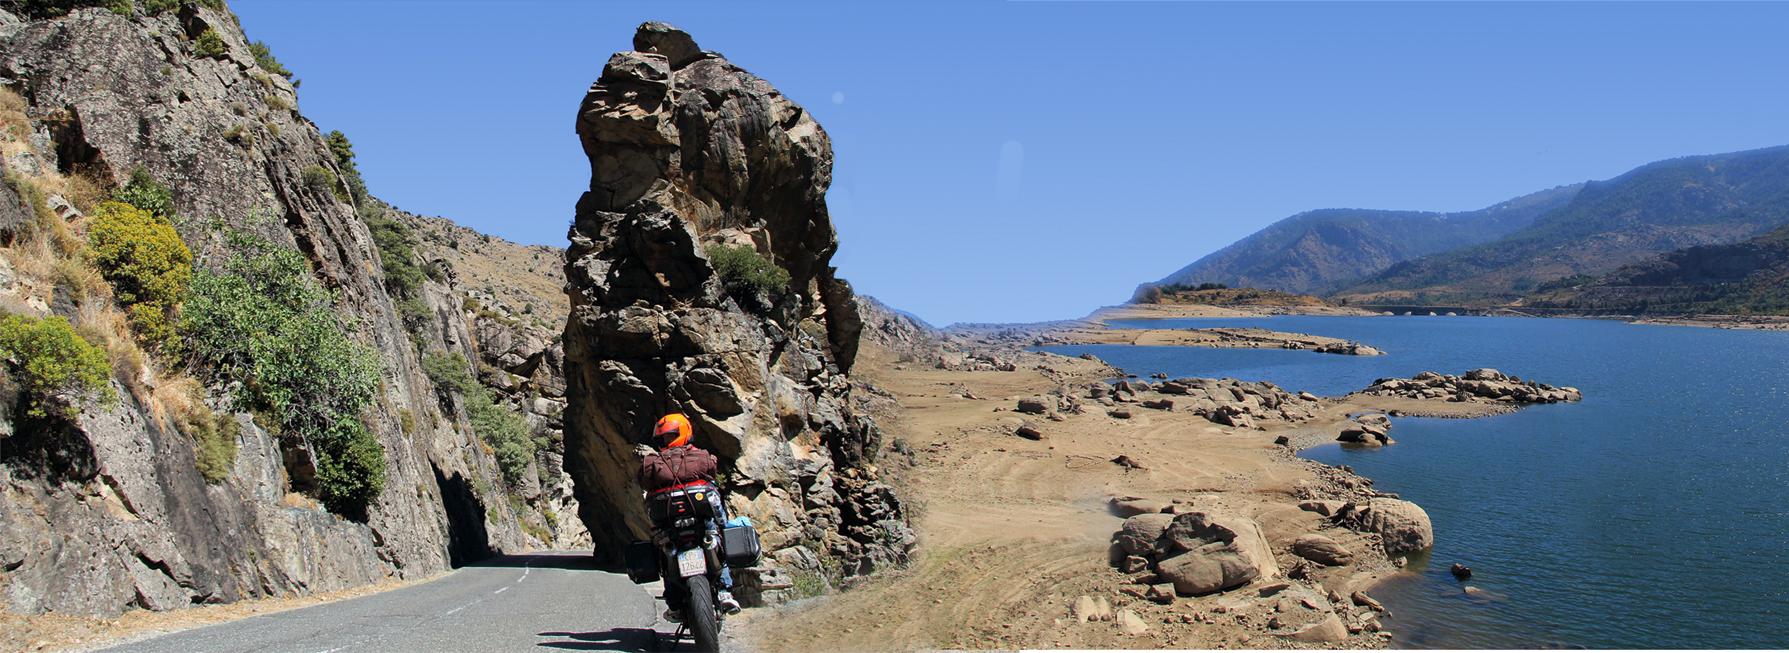 Córcega en moto discoverymoto.com, cerdeña, costa mediterranea